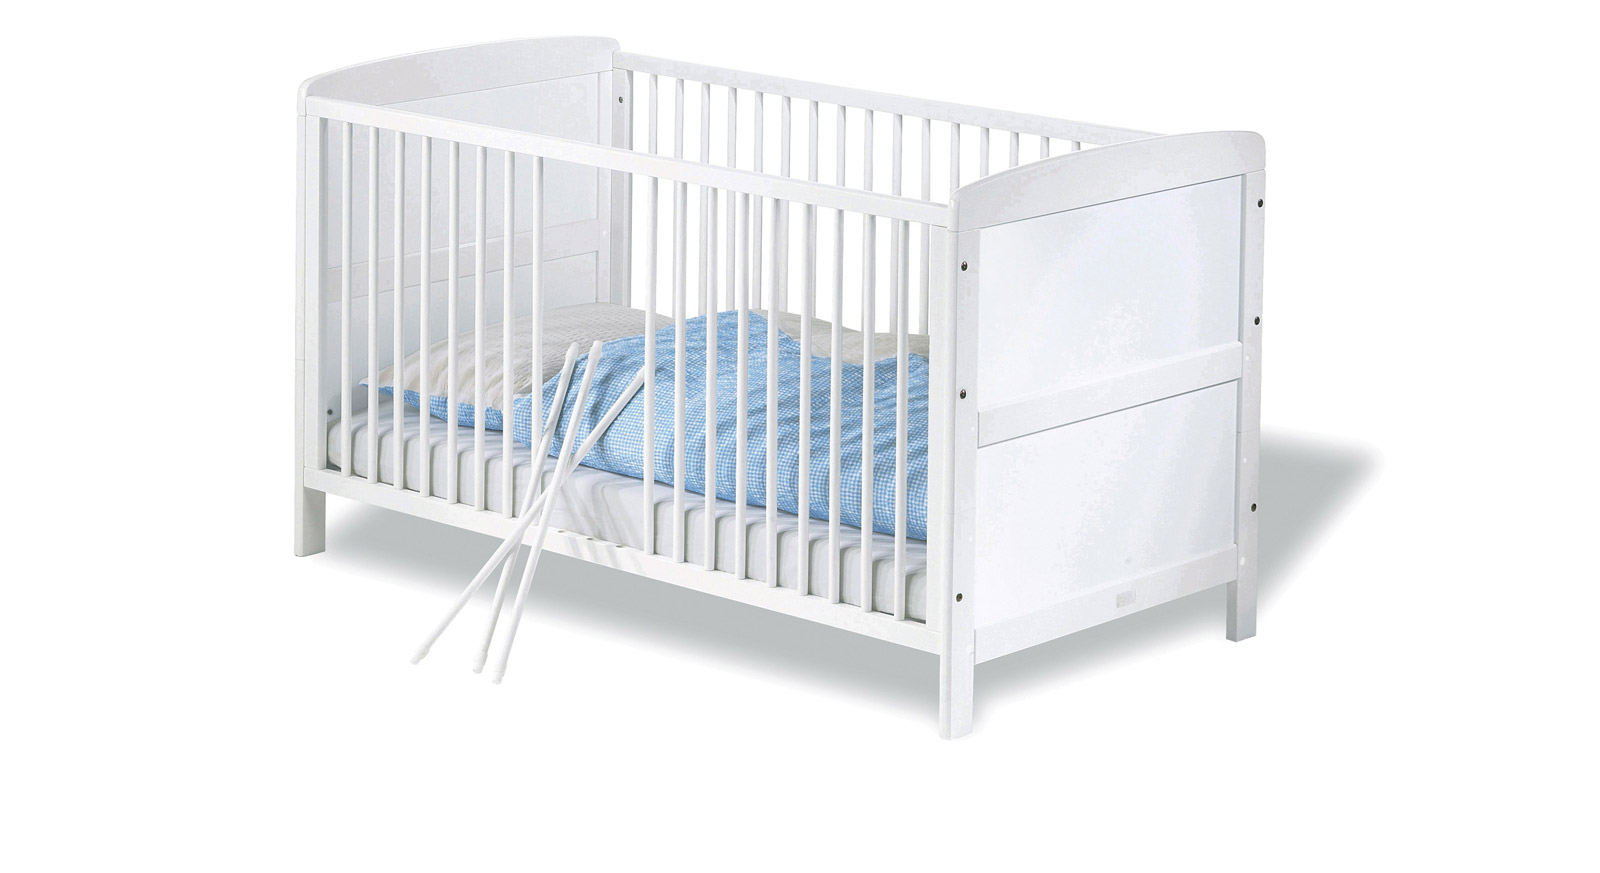 Kinderbett Julia Gitterbett herausnehmbare Schlupfsprossen